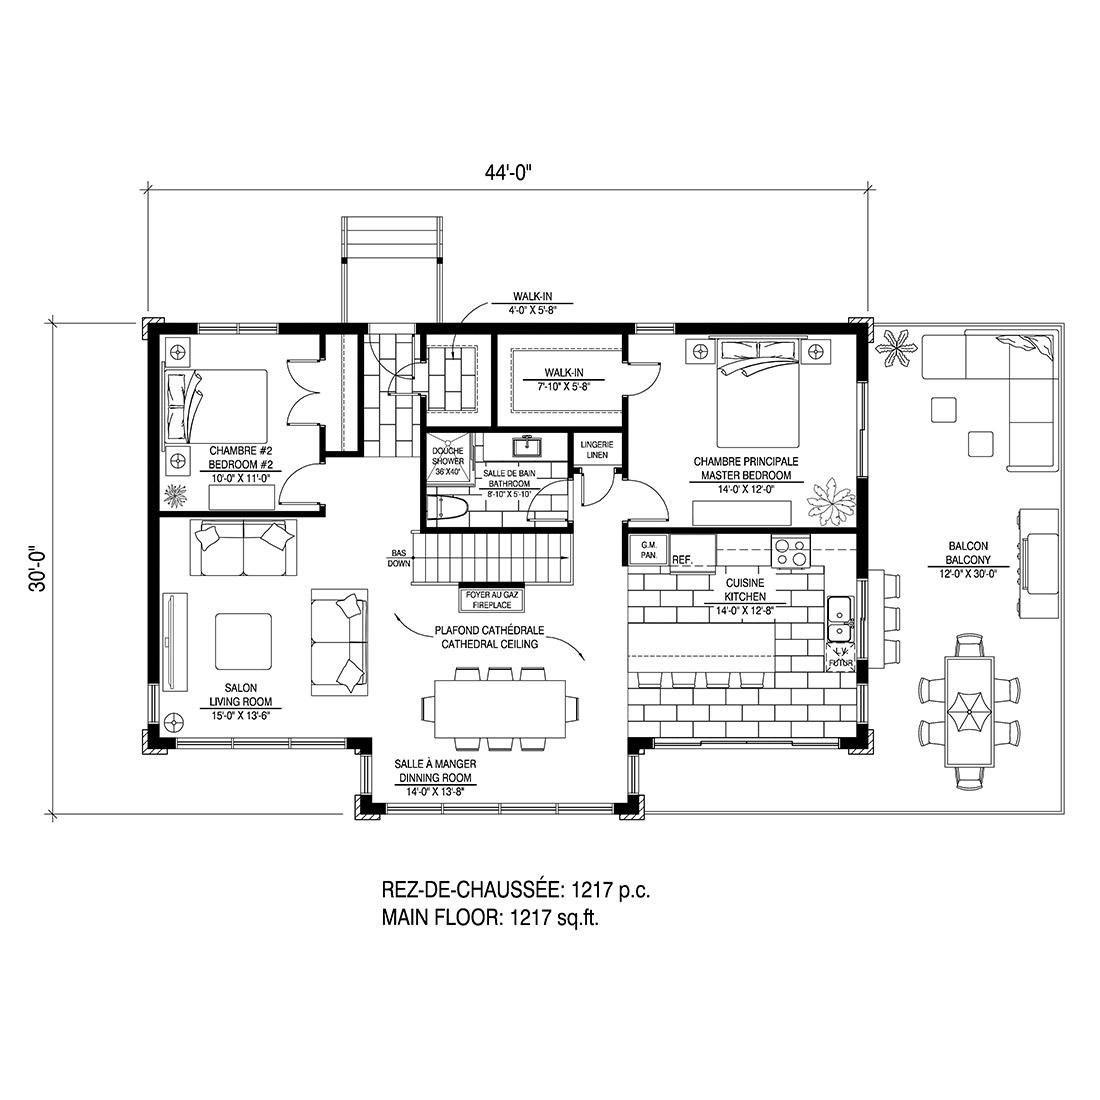 850-plan-rdc_realisation-amico